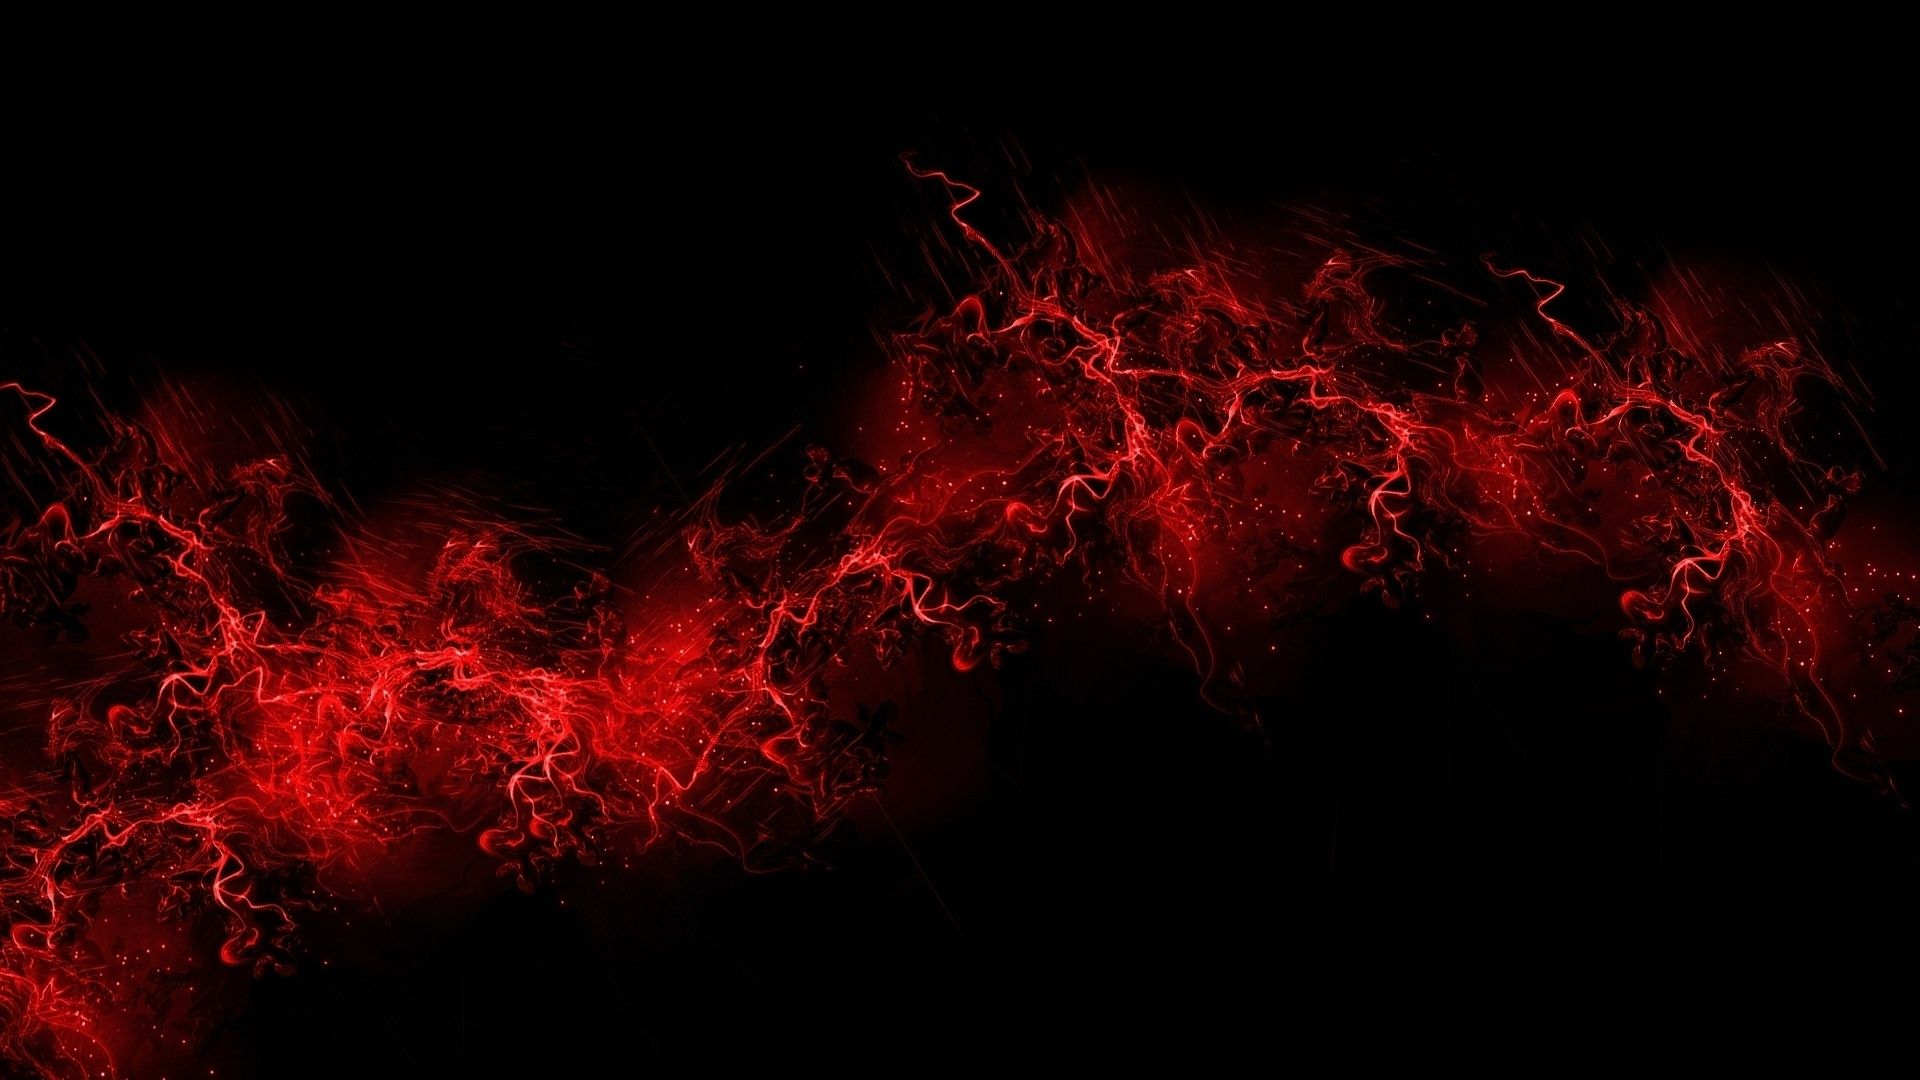 Dark Red Wallpaper – A Unique wallpaper Design